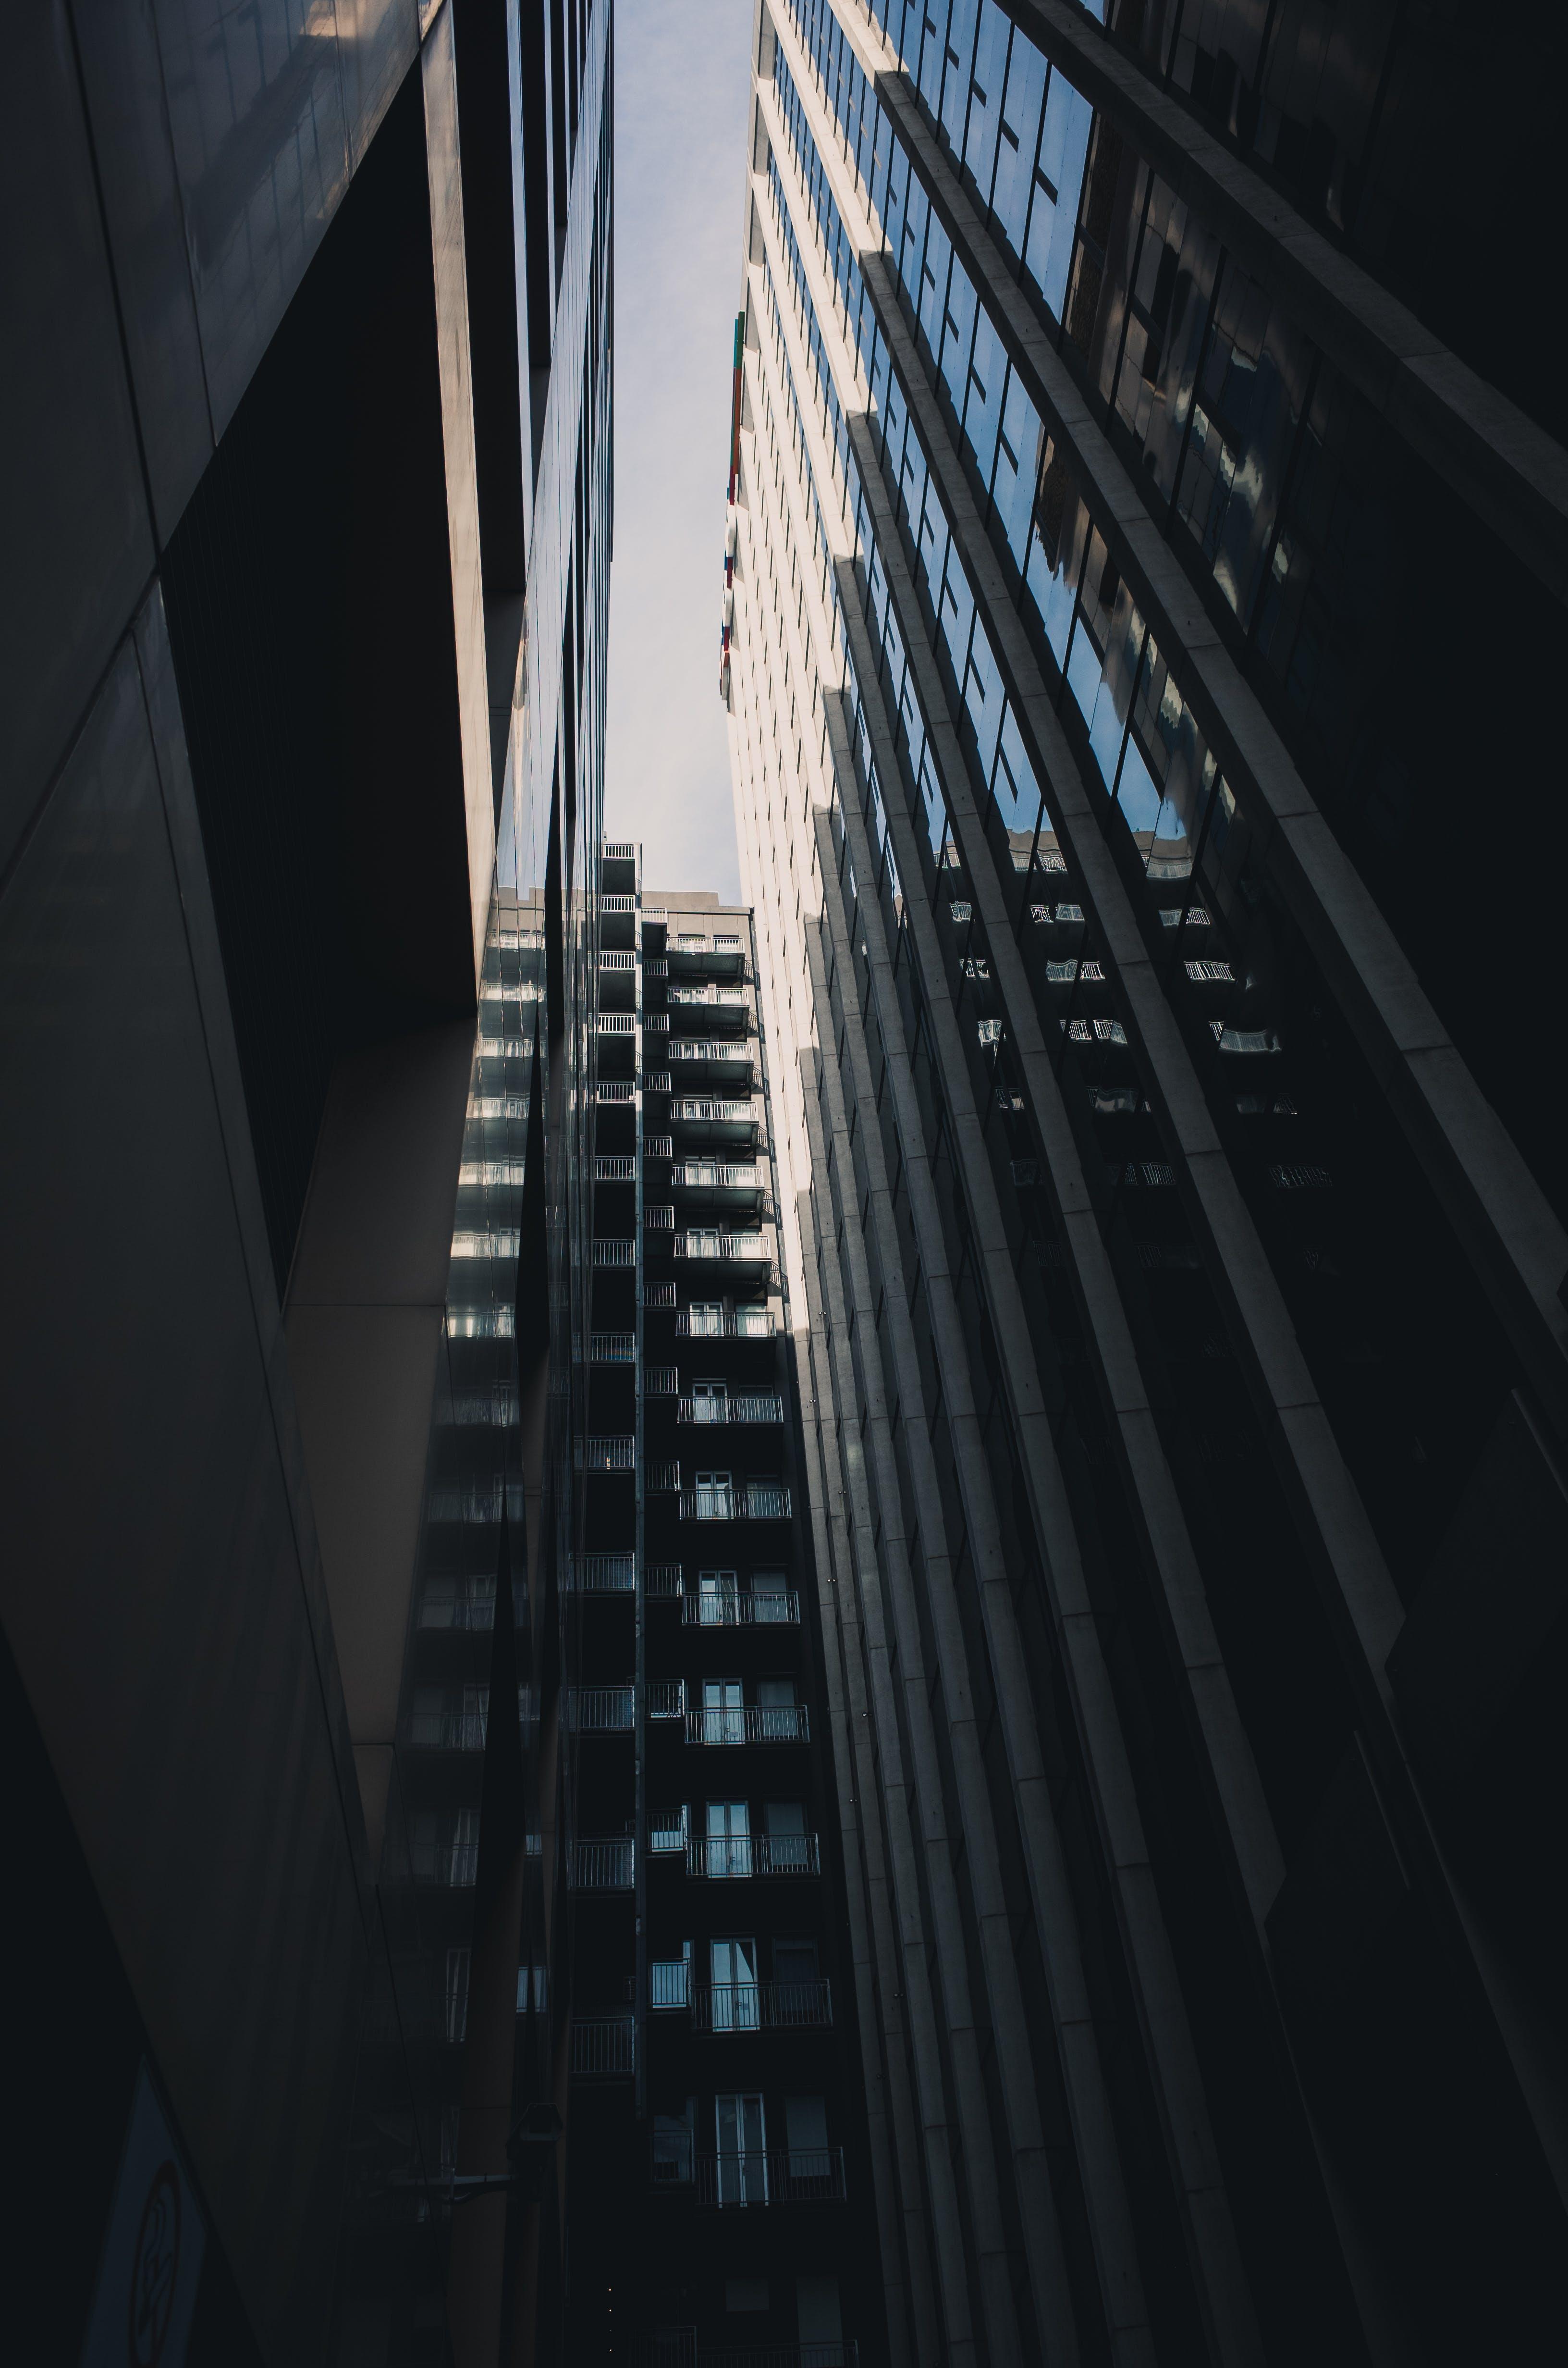 Foto stok gratis Arsitektur, bangunan, bidikan sudut sempit, biro